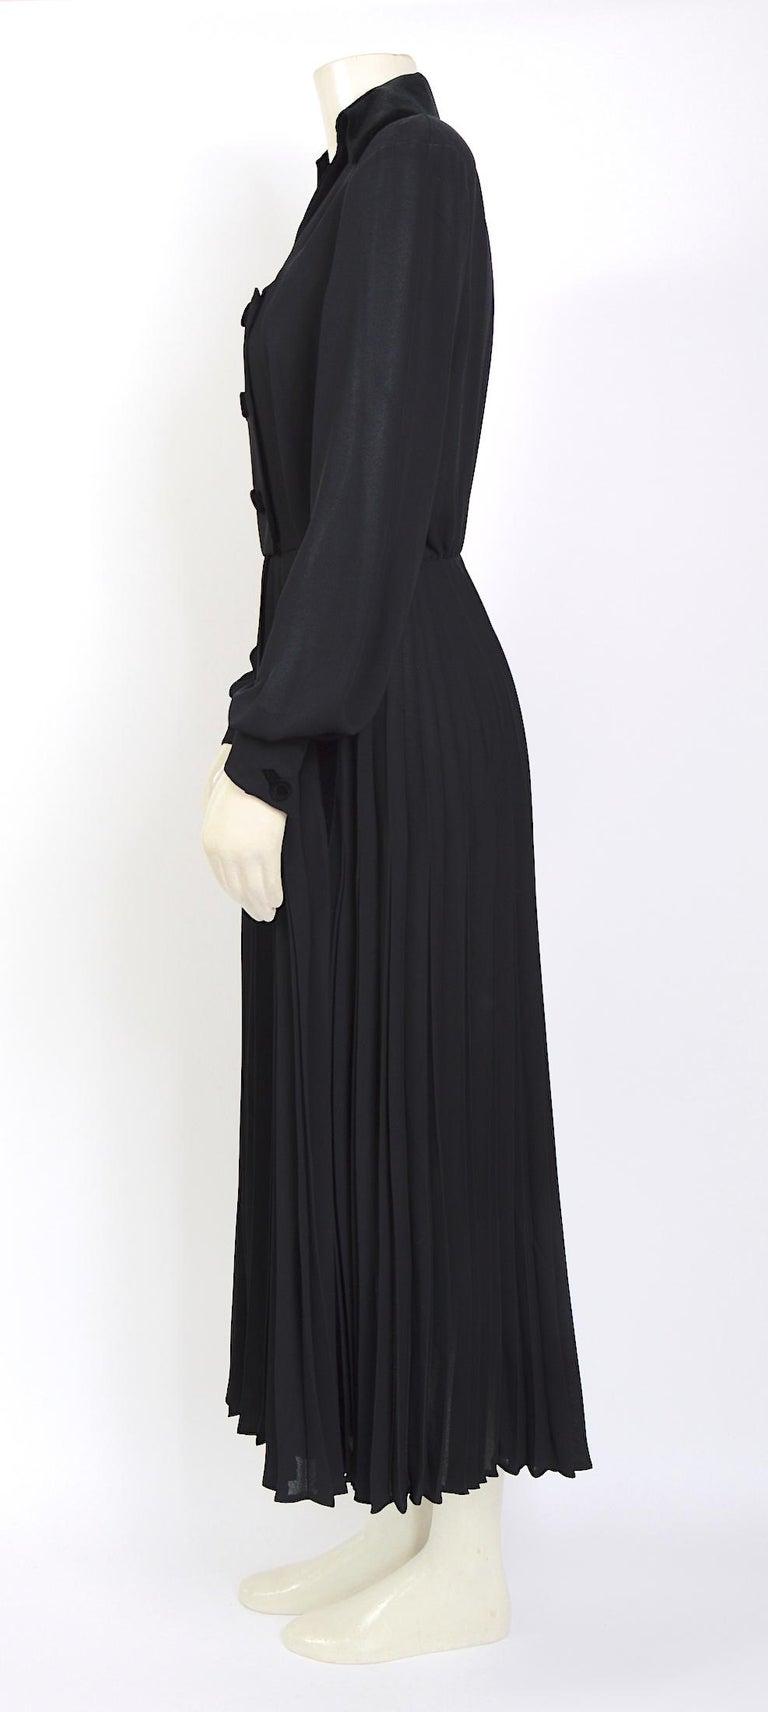 Black Thierry Mugler couture vintage 1980s black silk crepe and velvet details dress For Sale